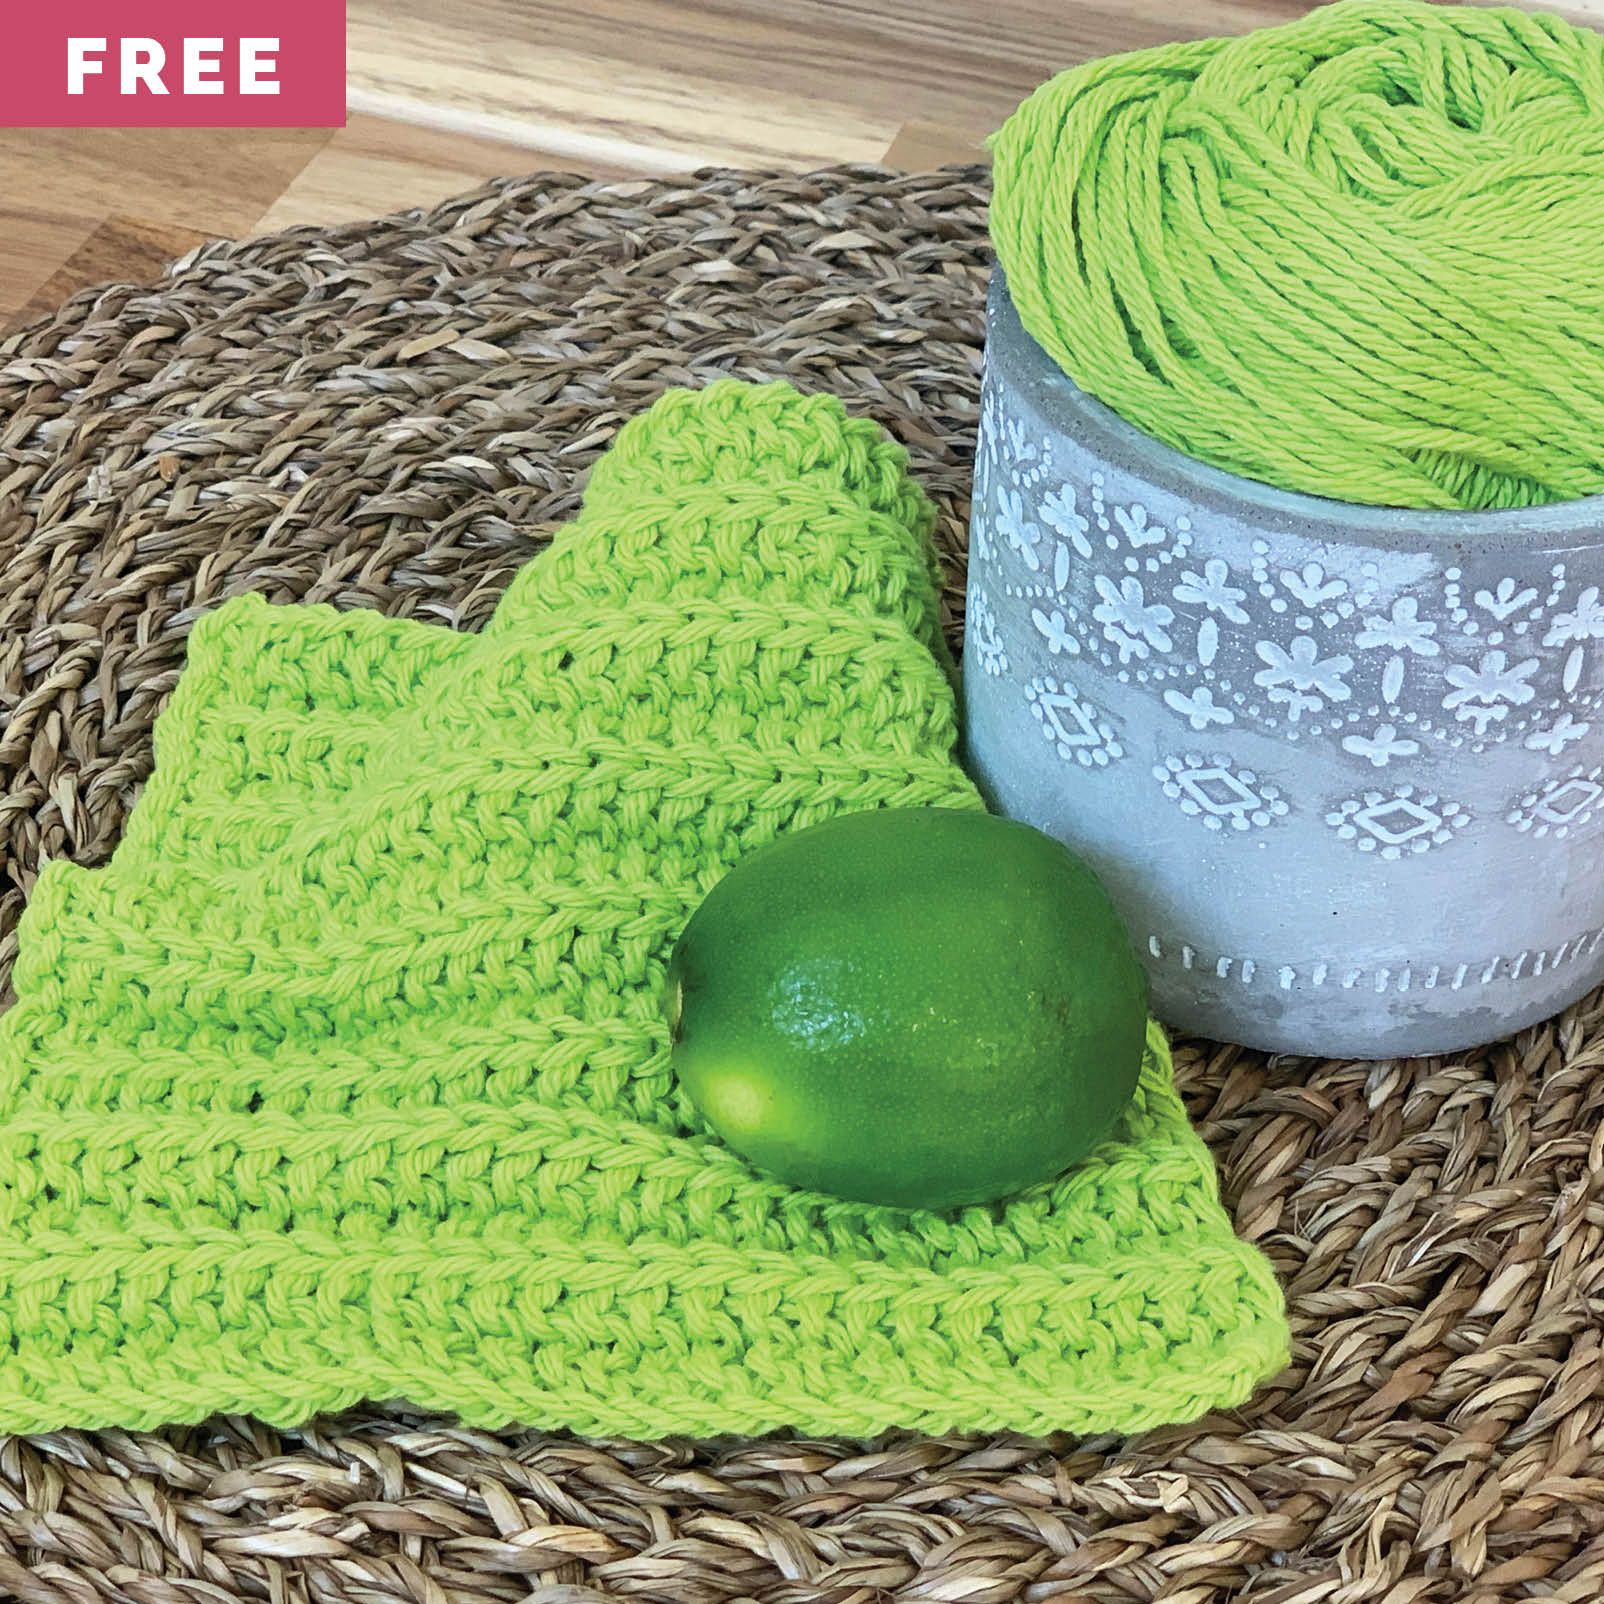 Free Knitting Pattern - No Purl Dishcloth